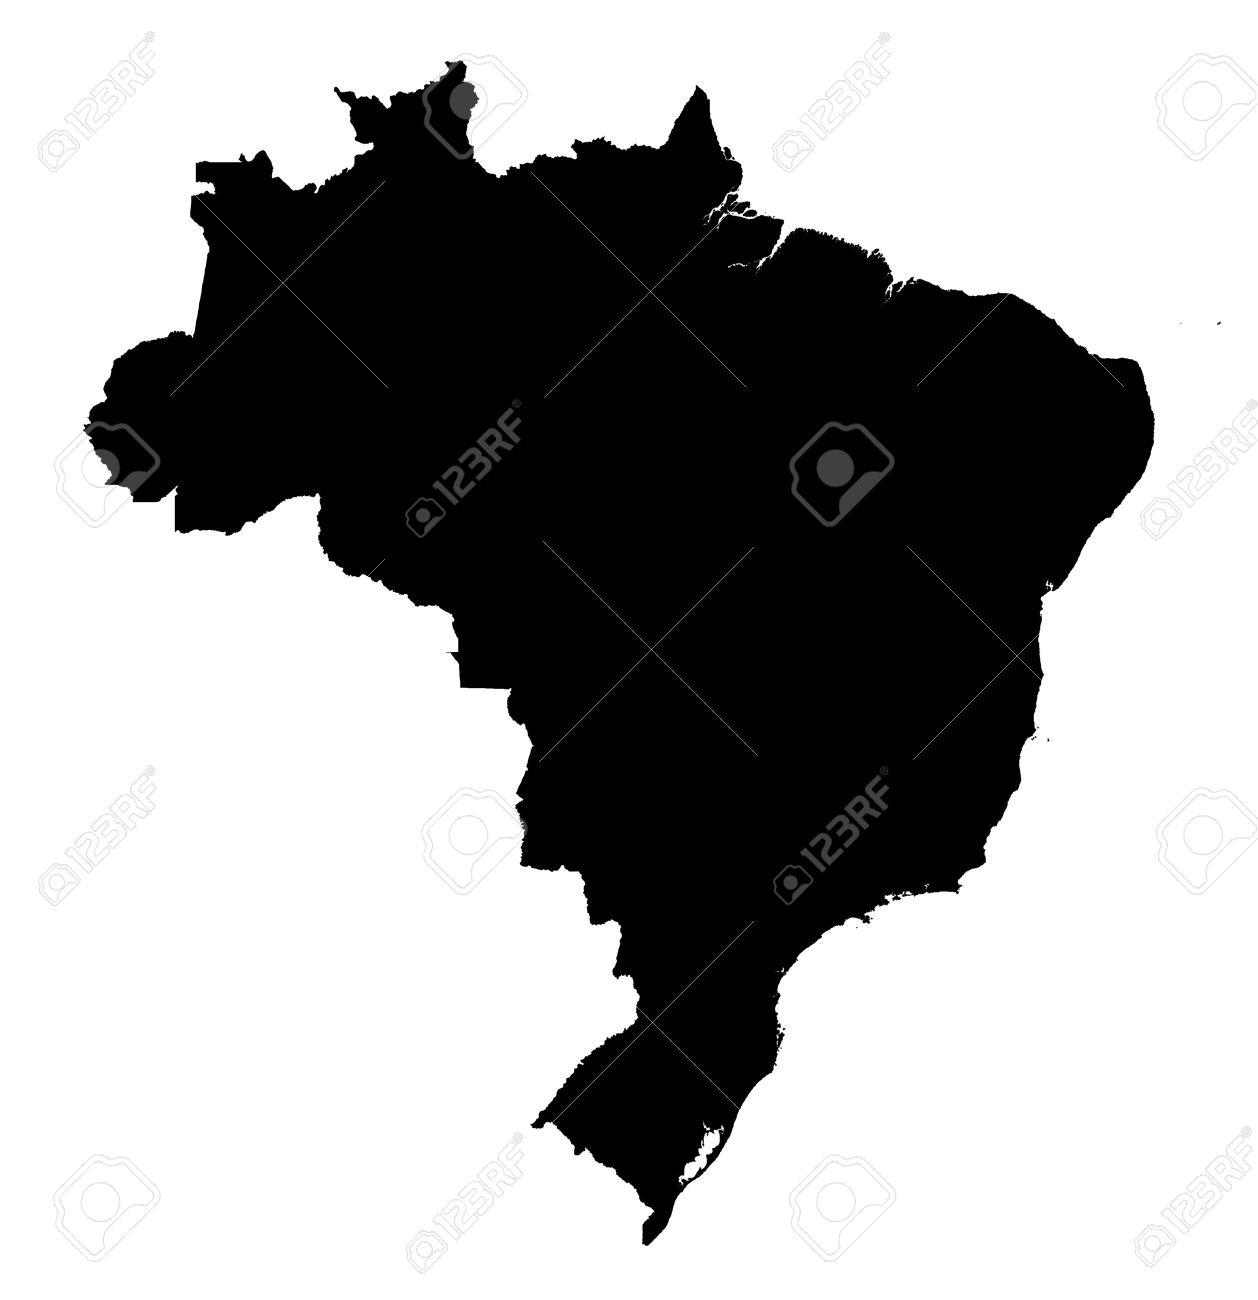 Brasil svg #14, Download drawings